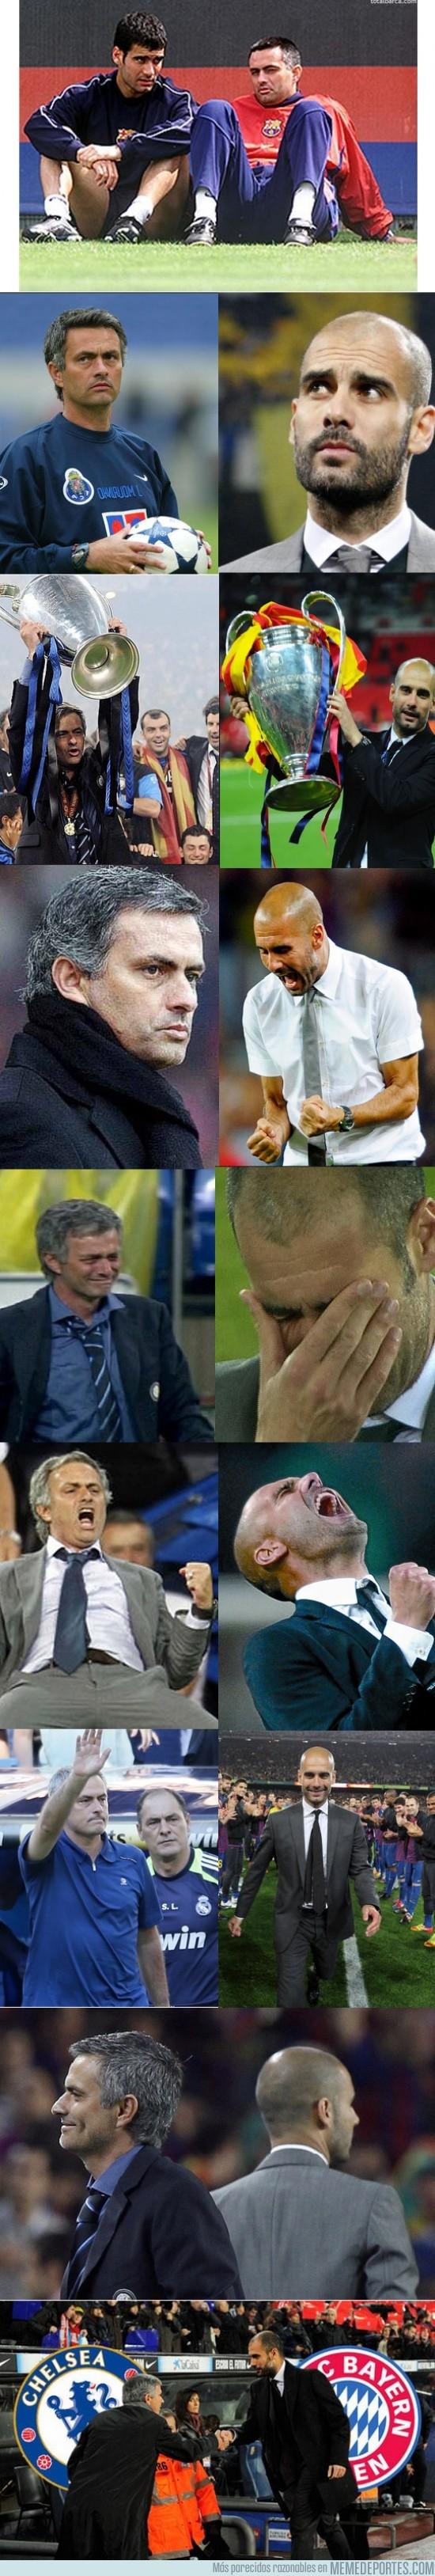 145378 - Jose Mourinho y Josep Guardiola, caminos paralelos